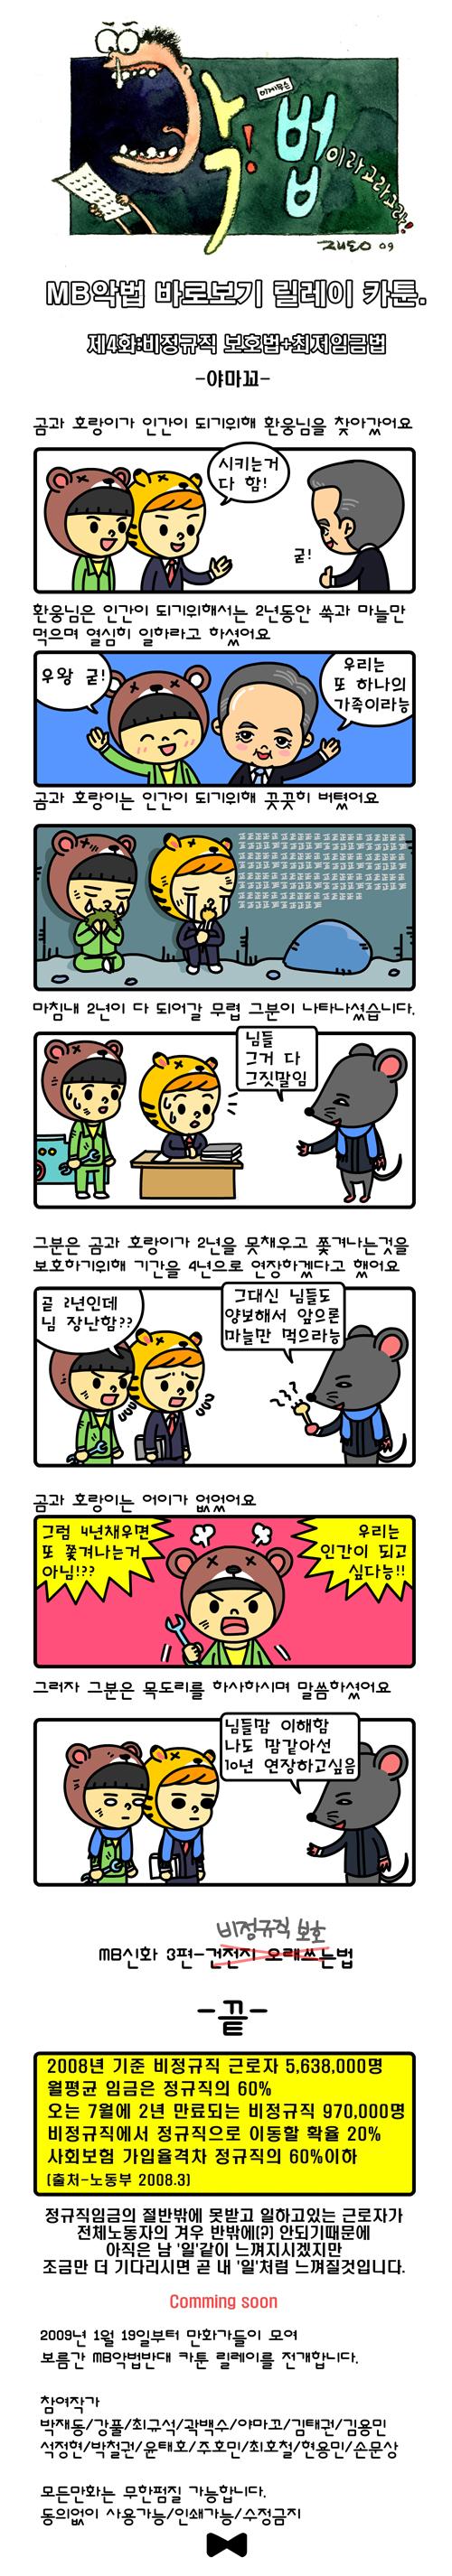 MB악법 저지 - 야마꼬